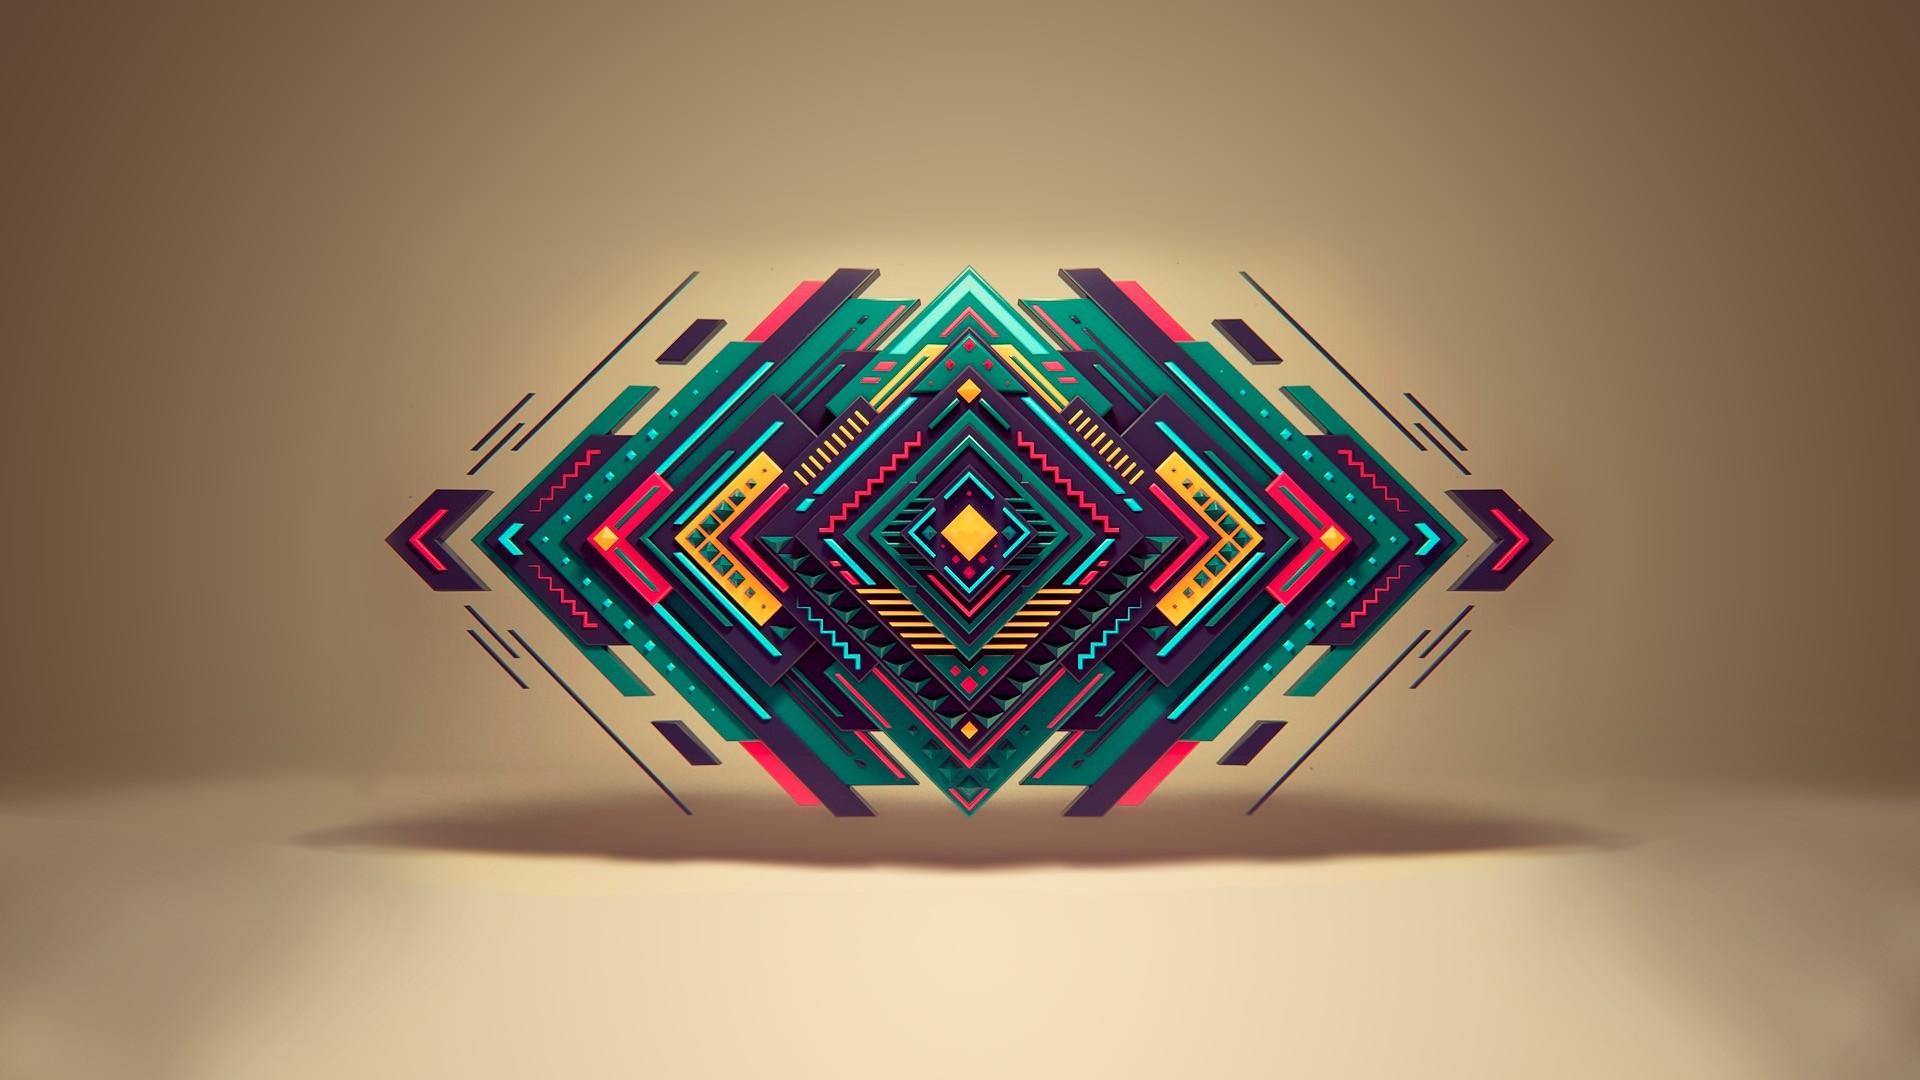 wallpaper-2849327